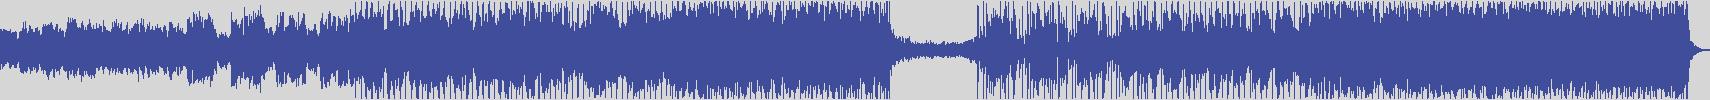 gold_hit_records [GHR005] Jordan Carletti - Emozioni [Radio Edit] audio wave form